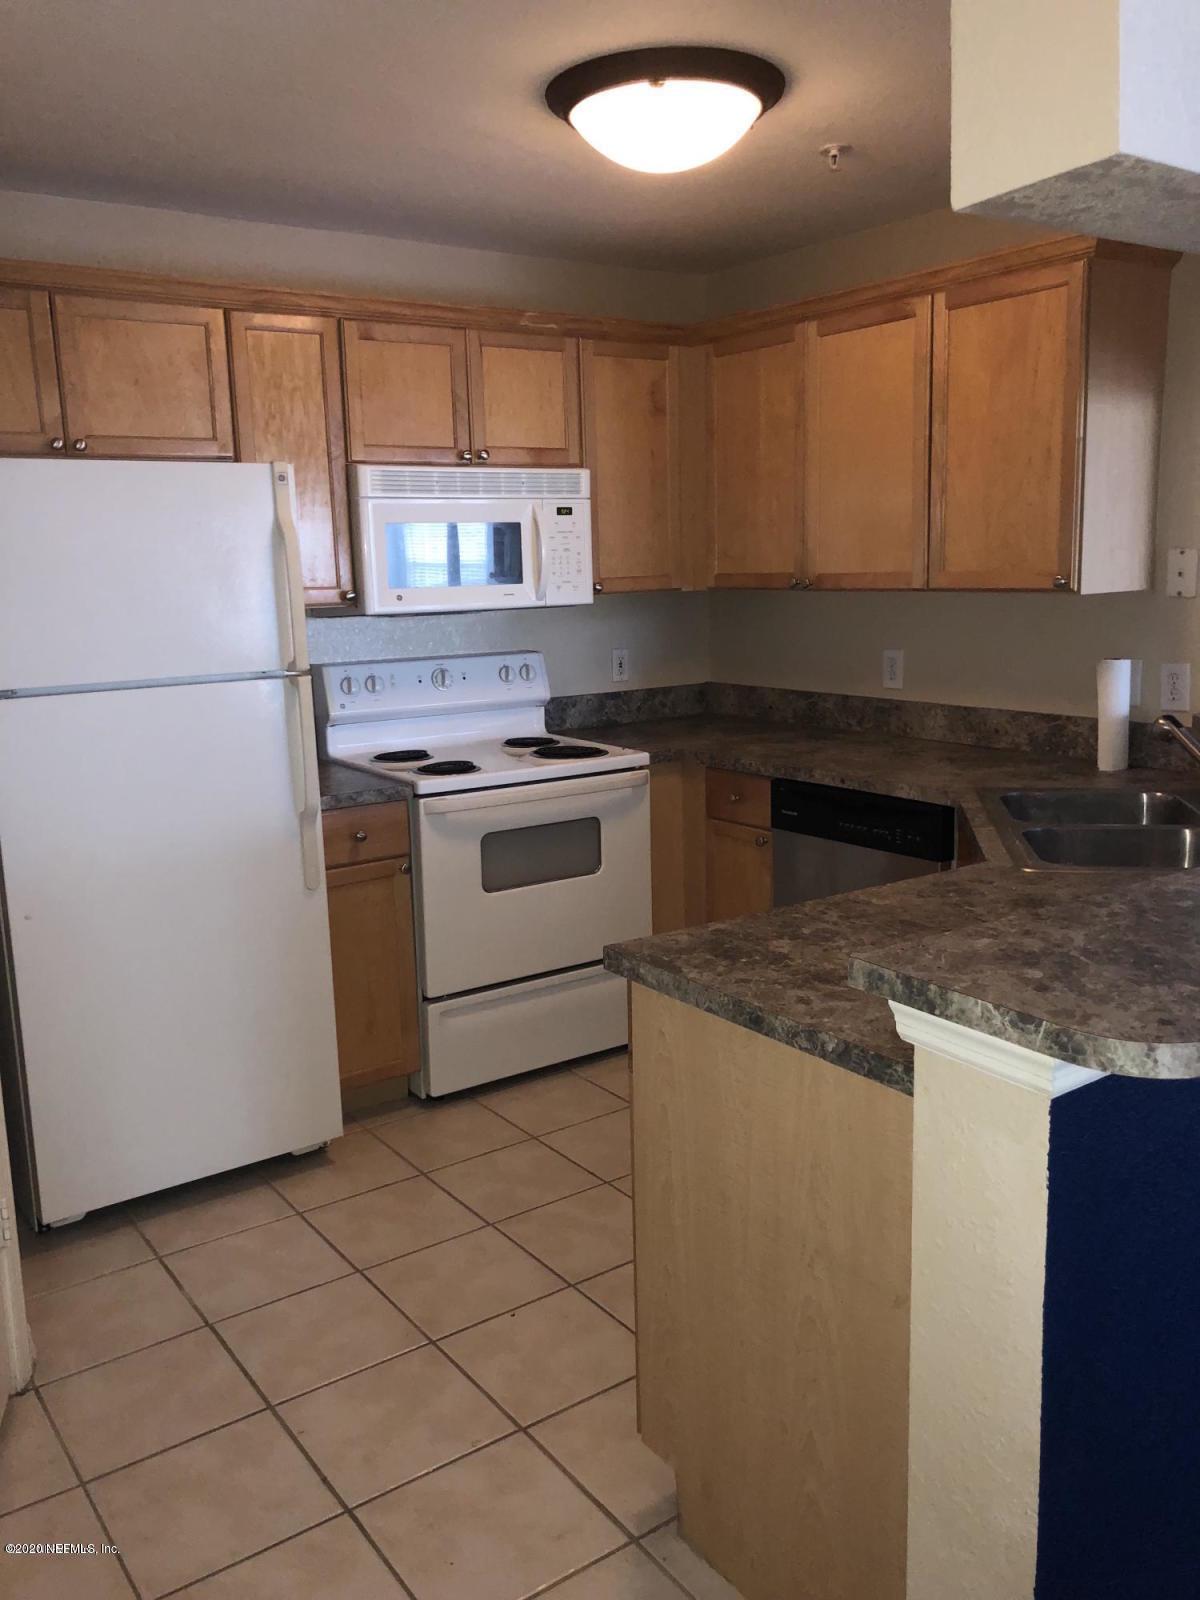 10961 BURNT MILL, JACKSONVILLE, FLORIDA 32256, 2 Bedrooms Bedrooms, ,2 BathroomsBathrooms,Residential,For sale,BURNT MILL,1082358